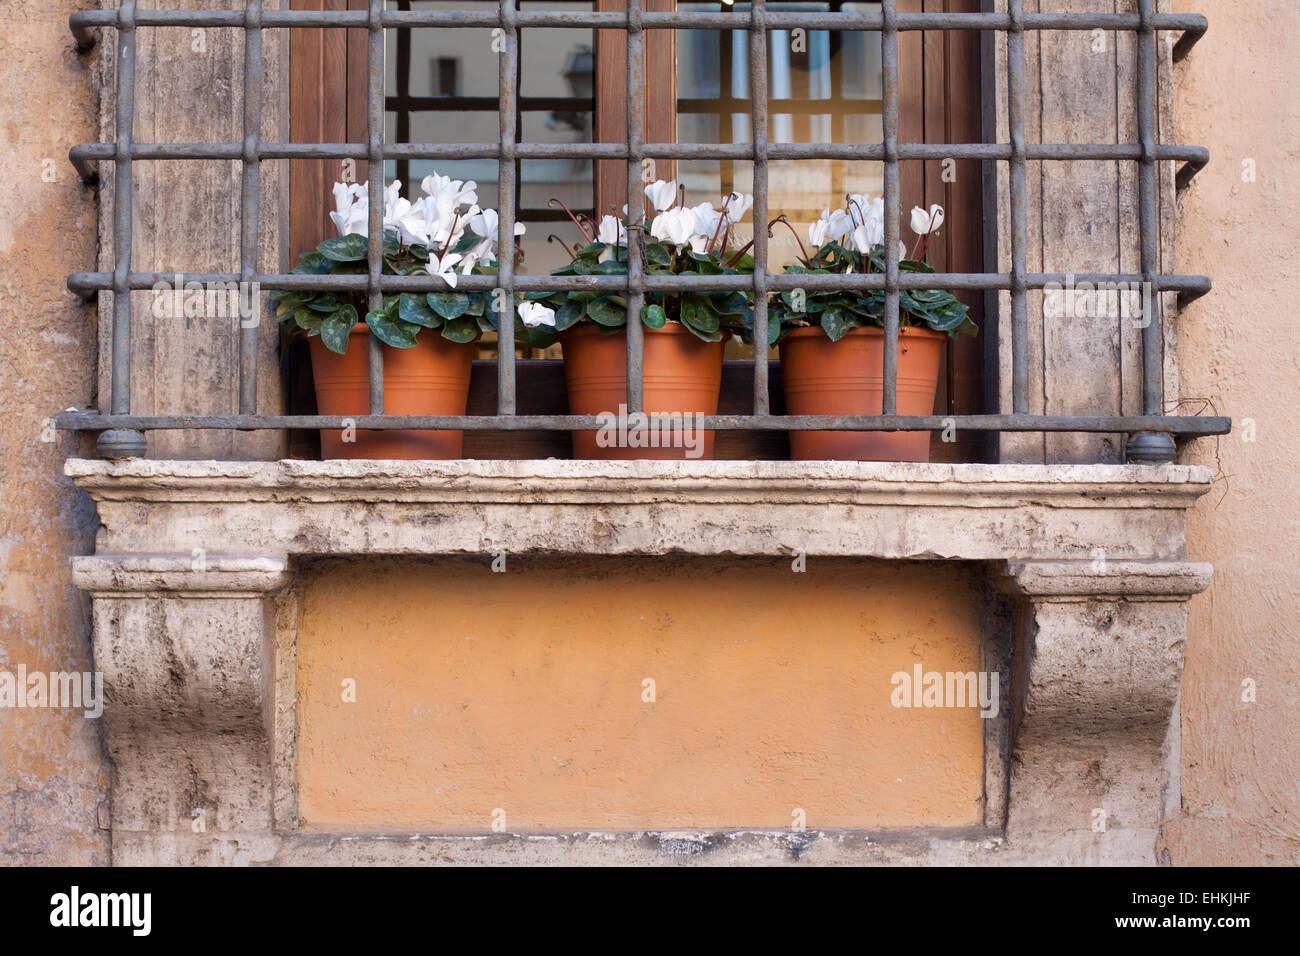 Three flowers in flowerpots on windowsill behind metal lattice in Italy - Stock Image